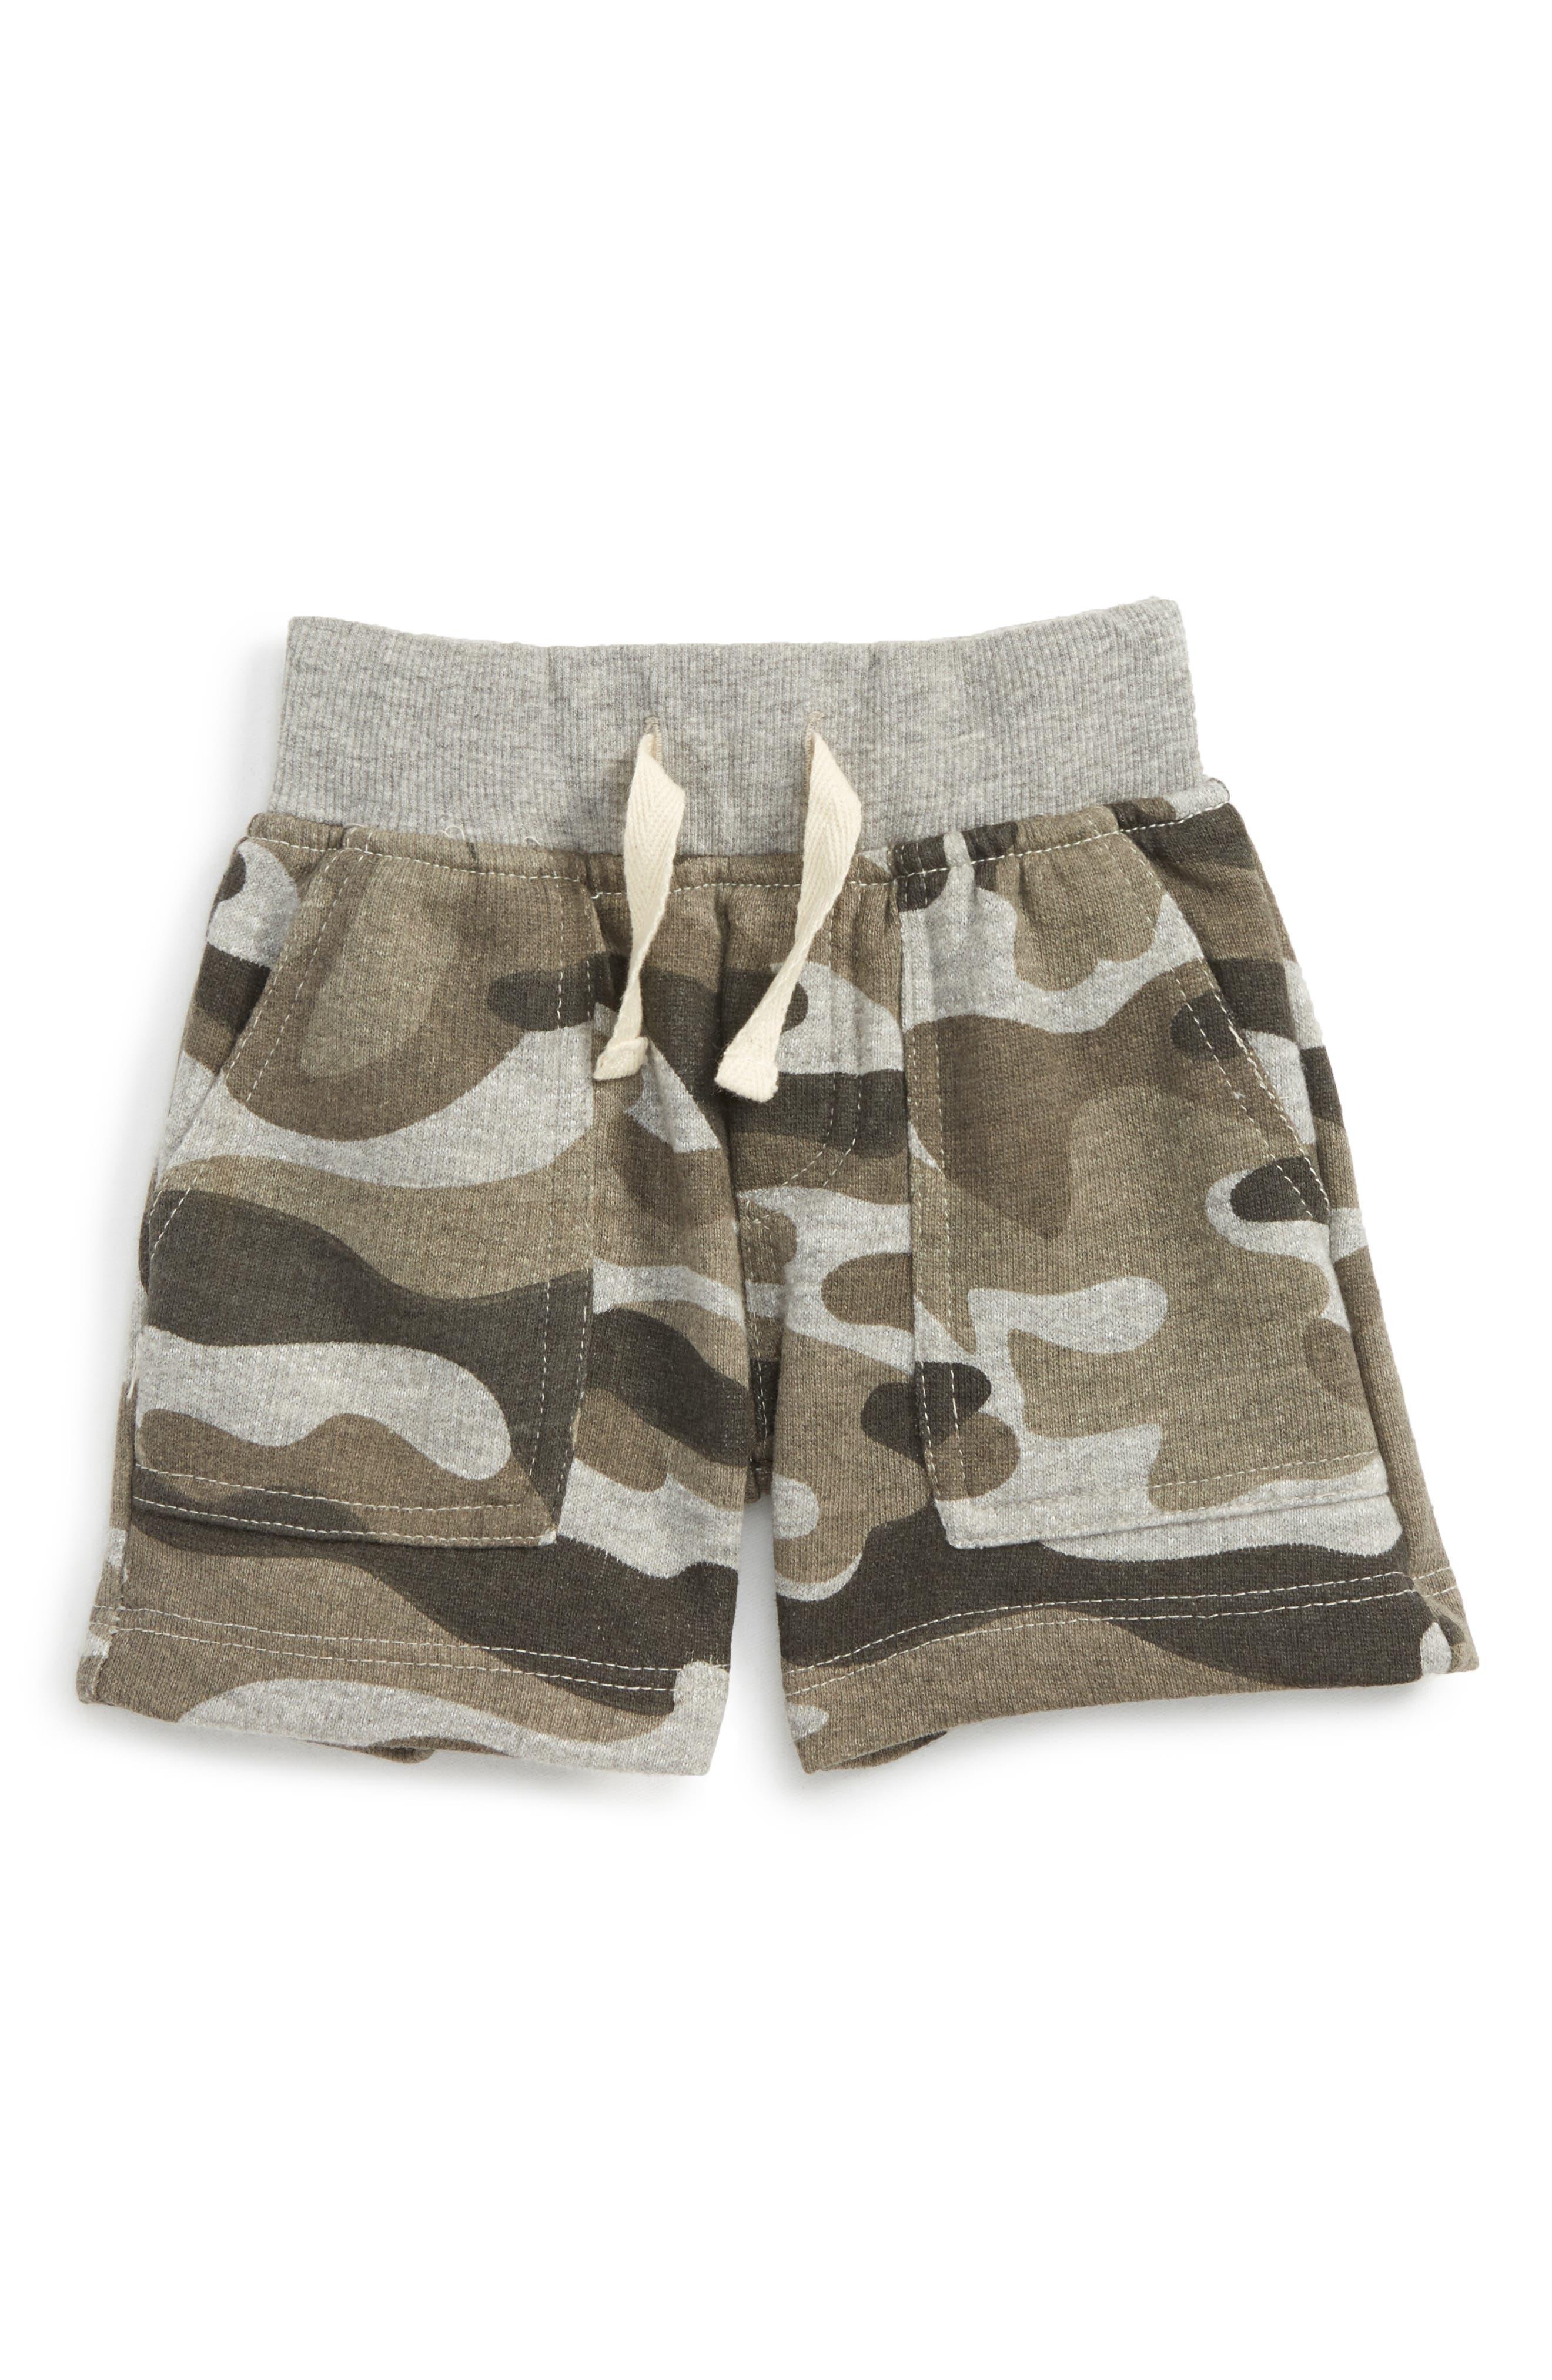 Stephen Camo Shorts